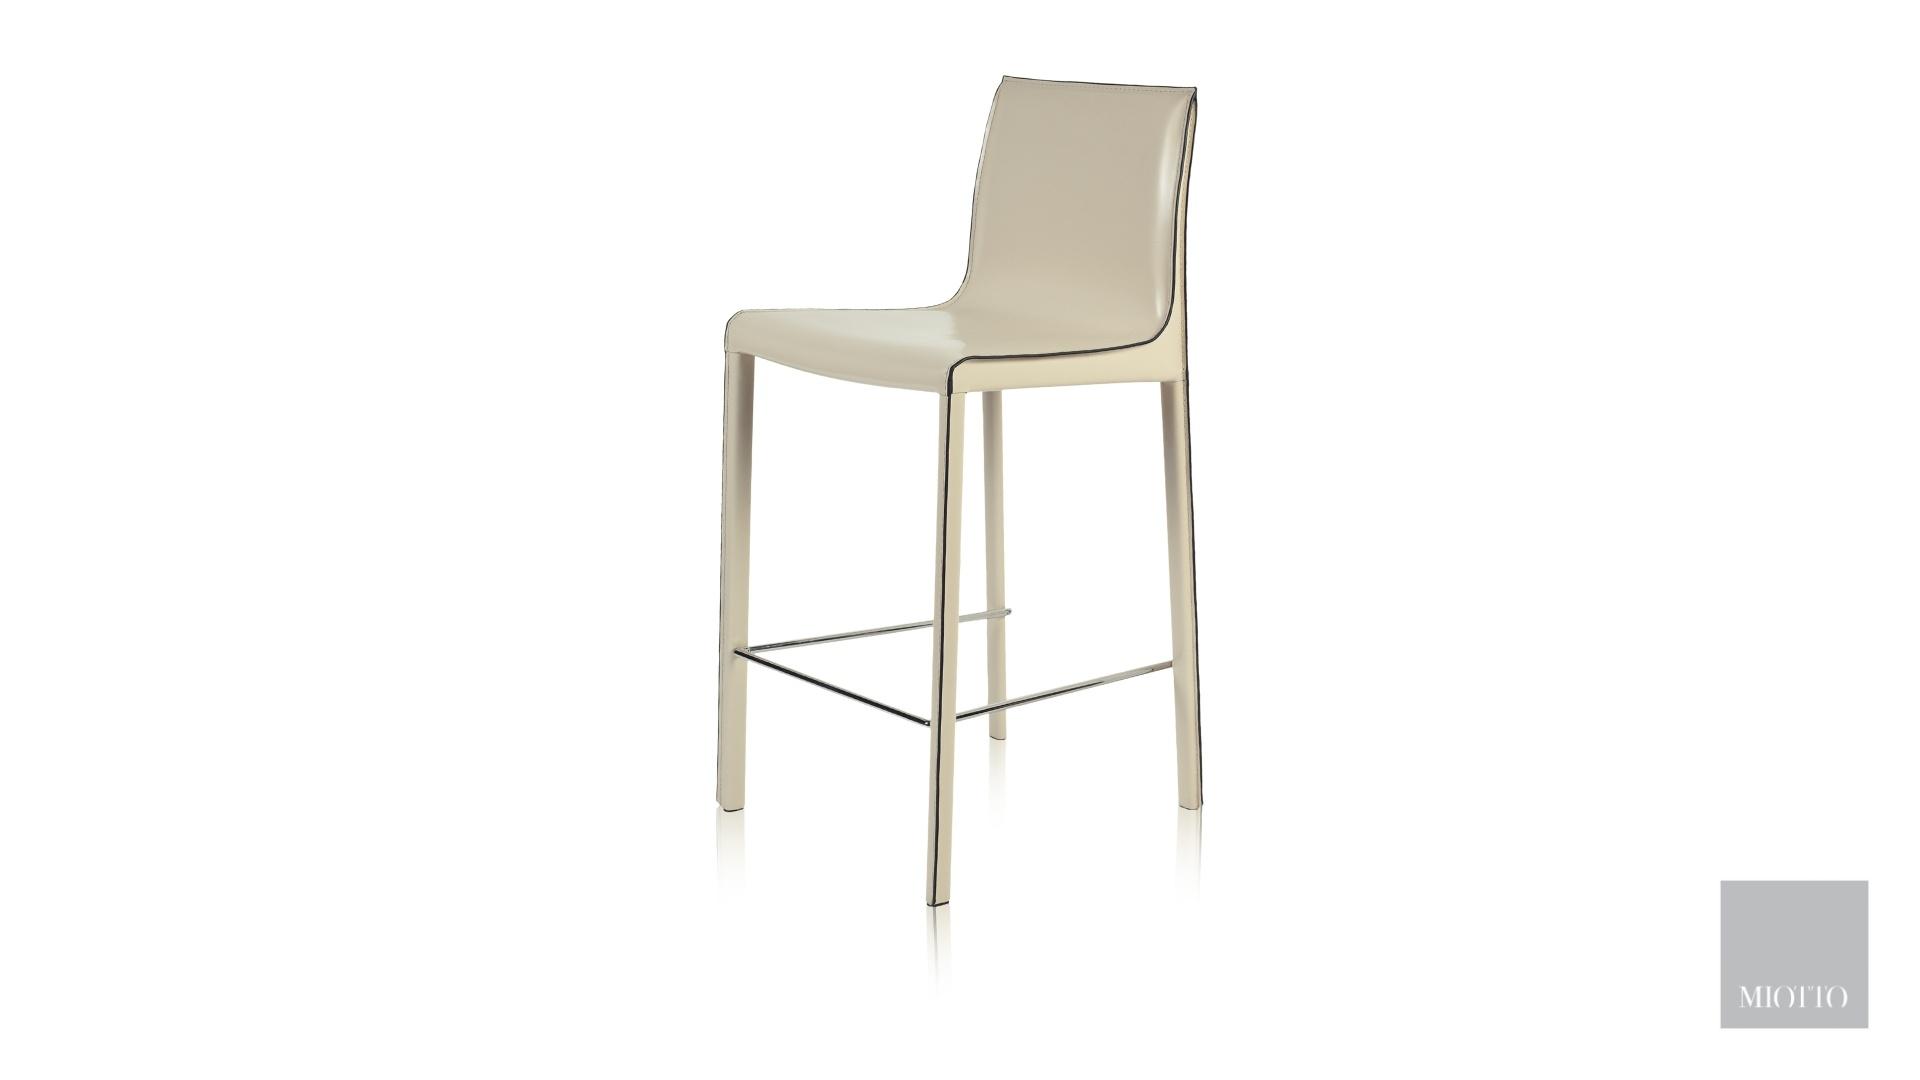 miotto_Ardini bar stool beige miotto furniture t